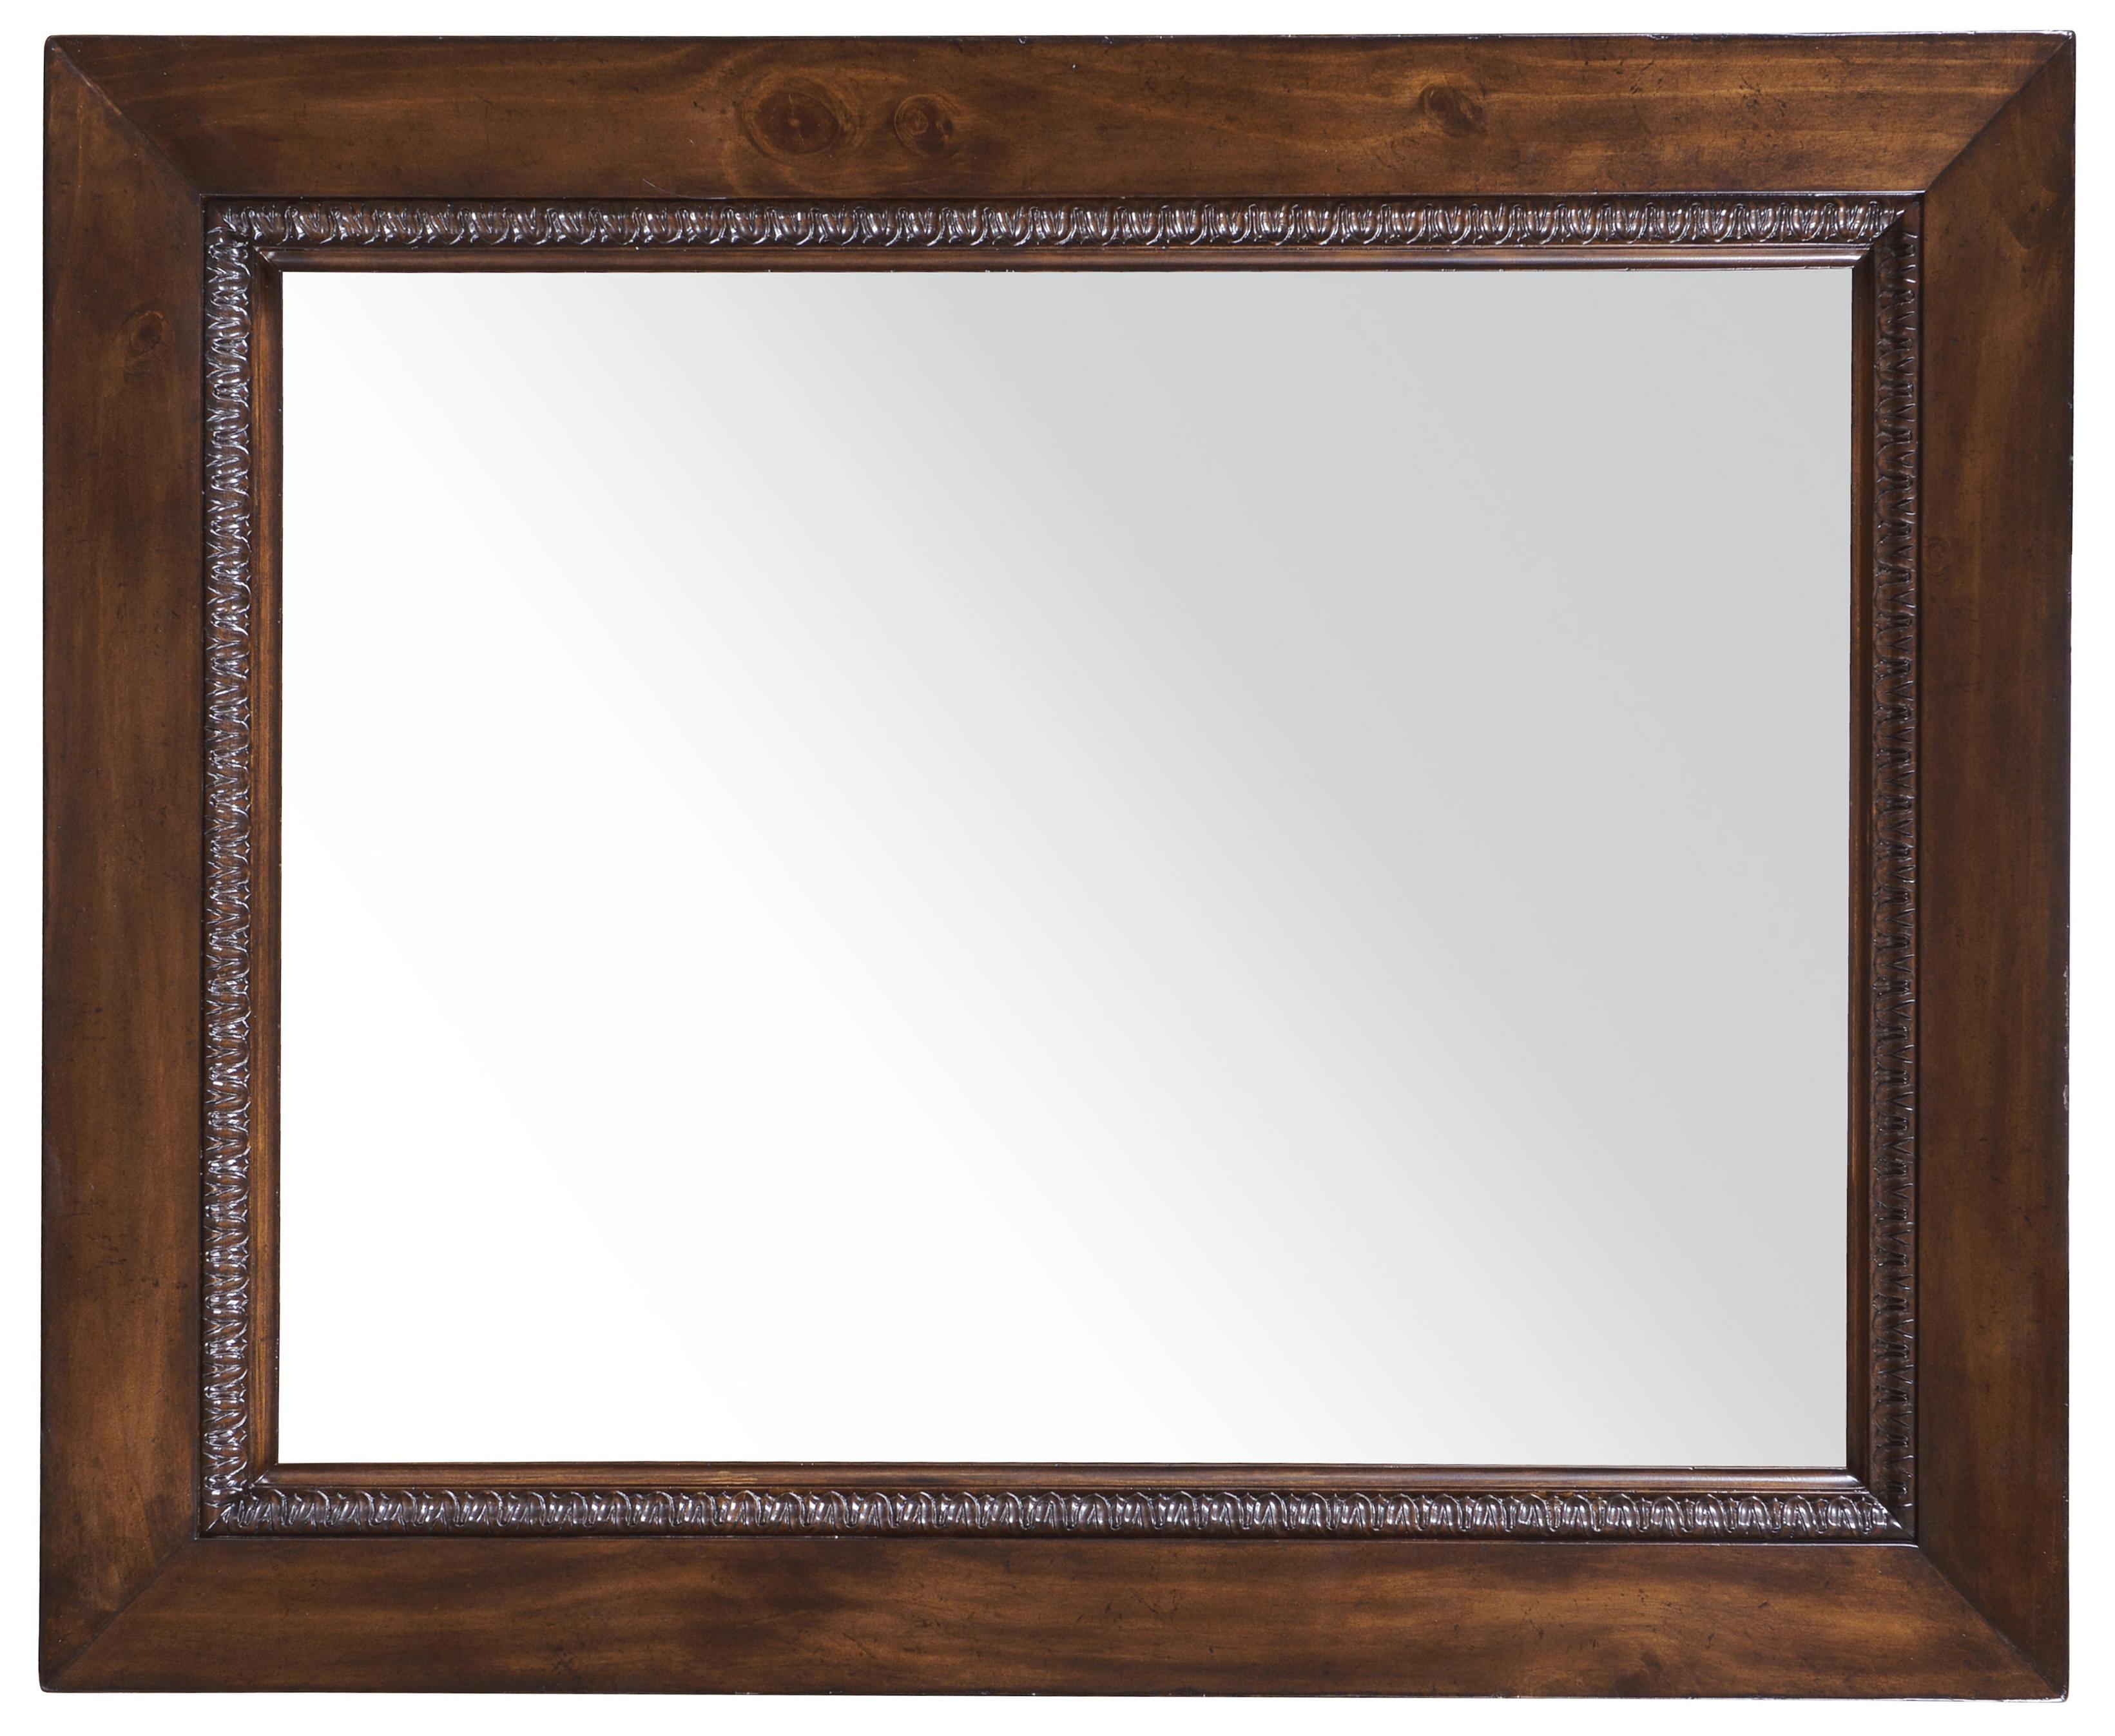 Belfort Signature Edwards Ferry Landscape Mirror - Item Number: 210120-2106